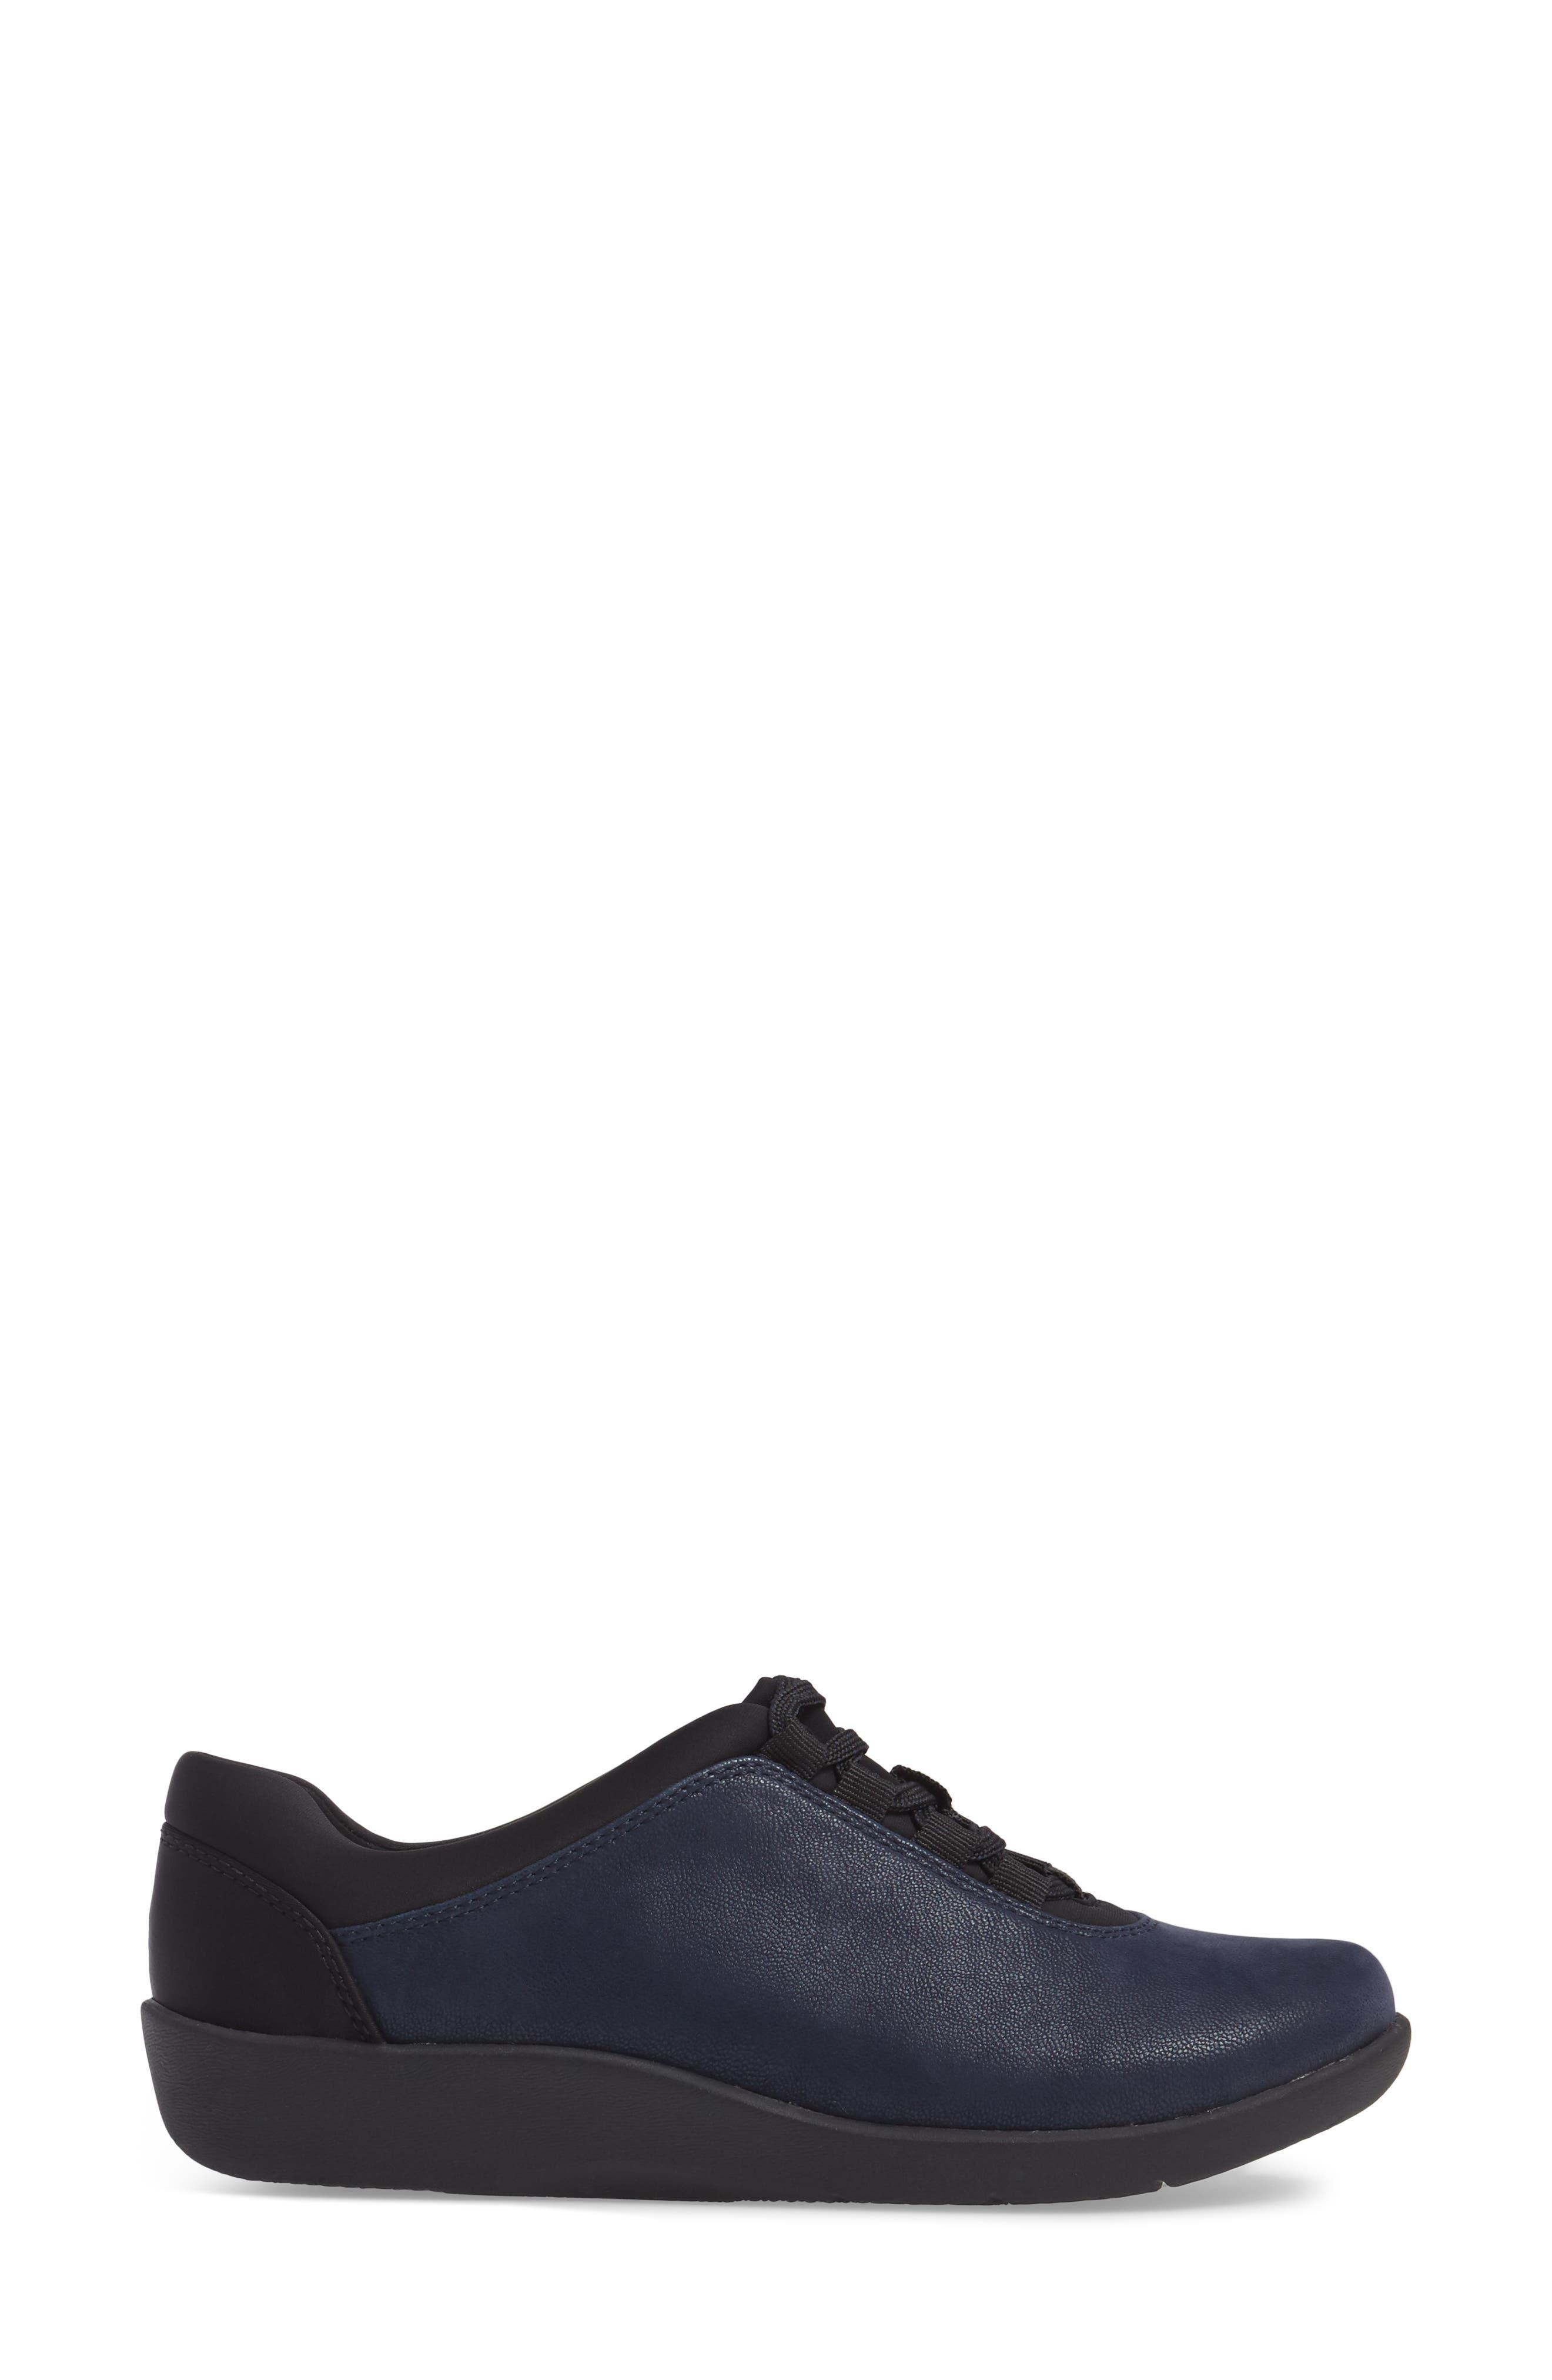 Sillian Pine Sneaker,                             Alternate thumbnail 3, color,                             Navy Canvas